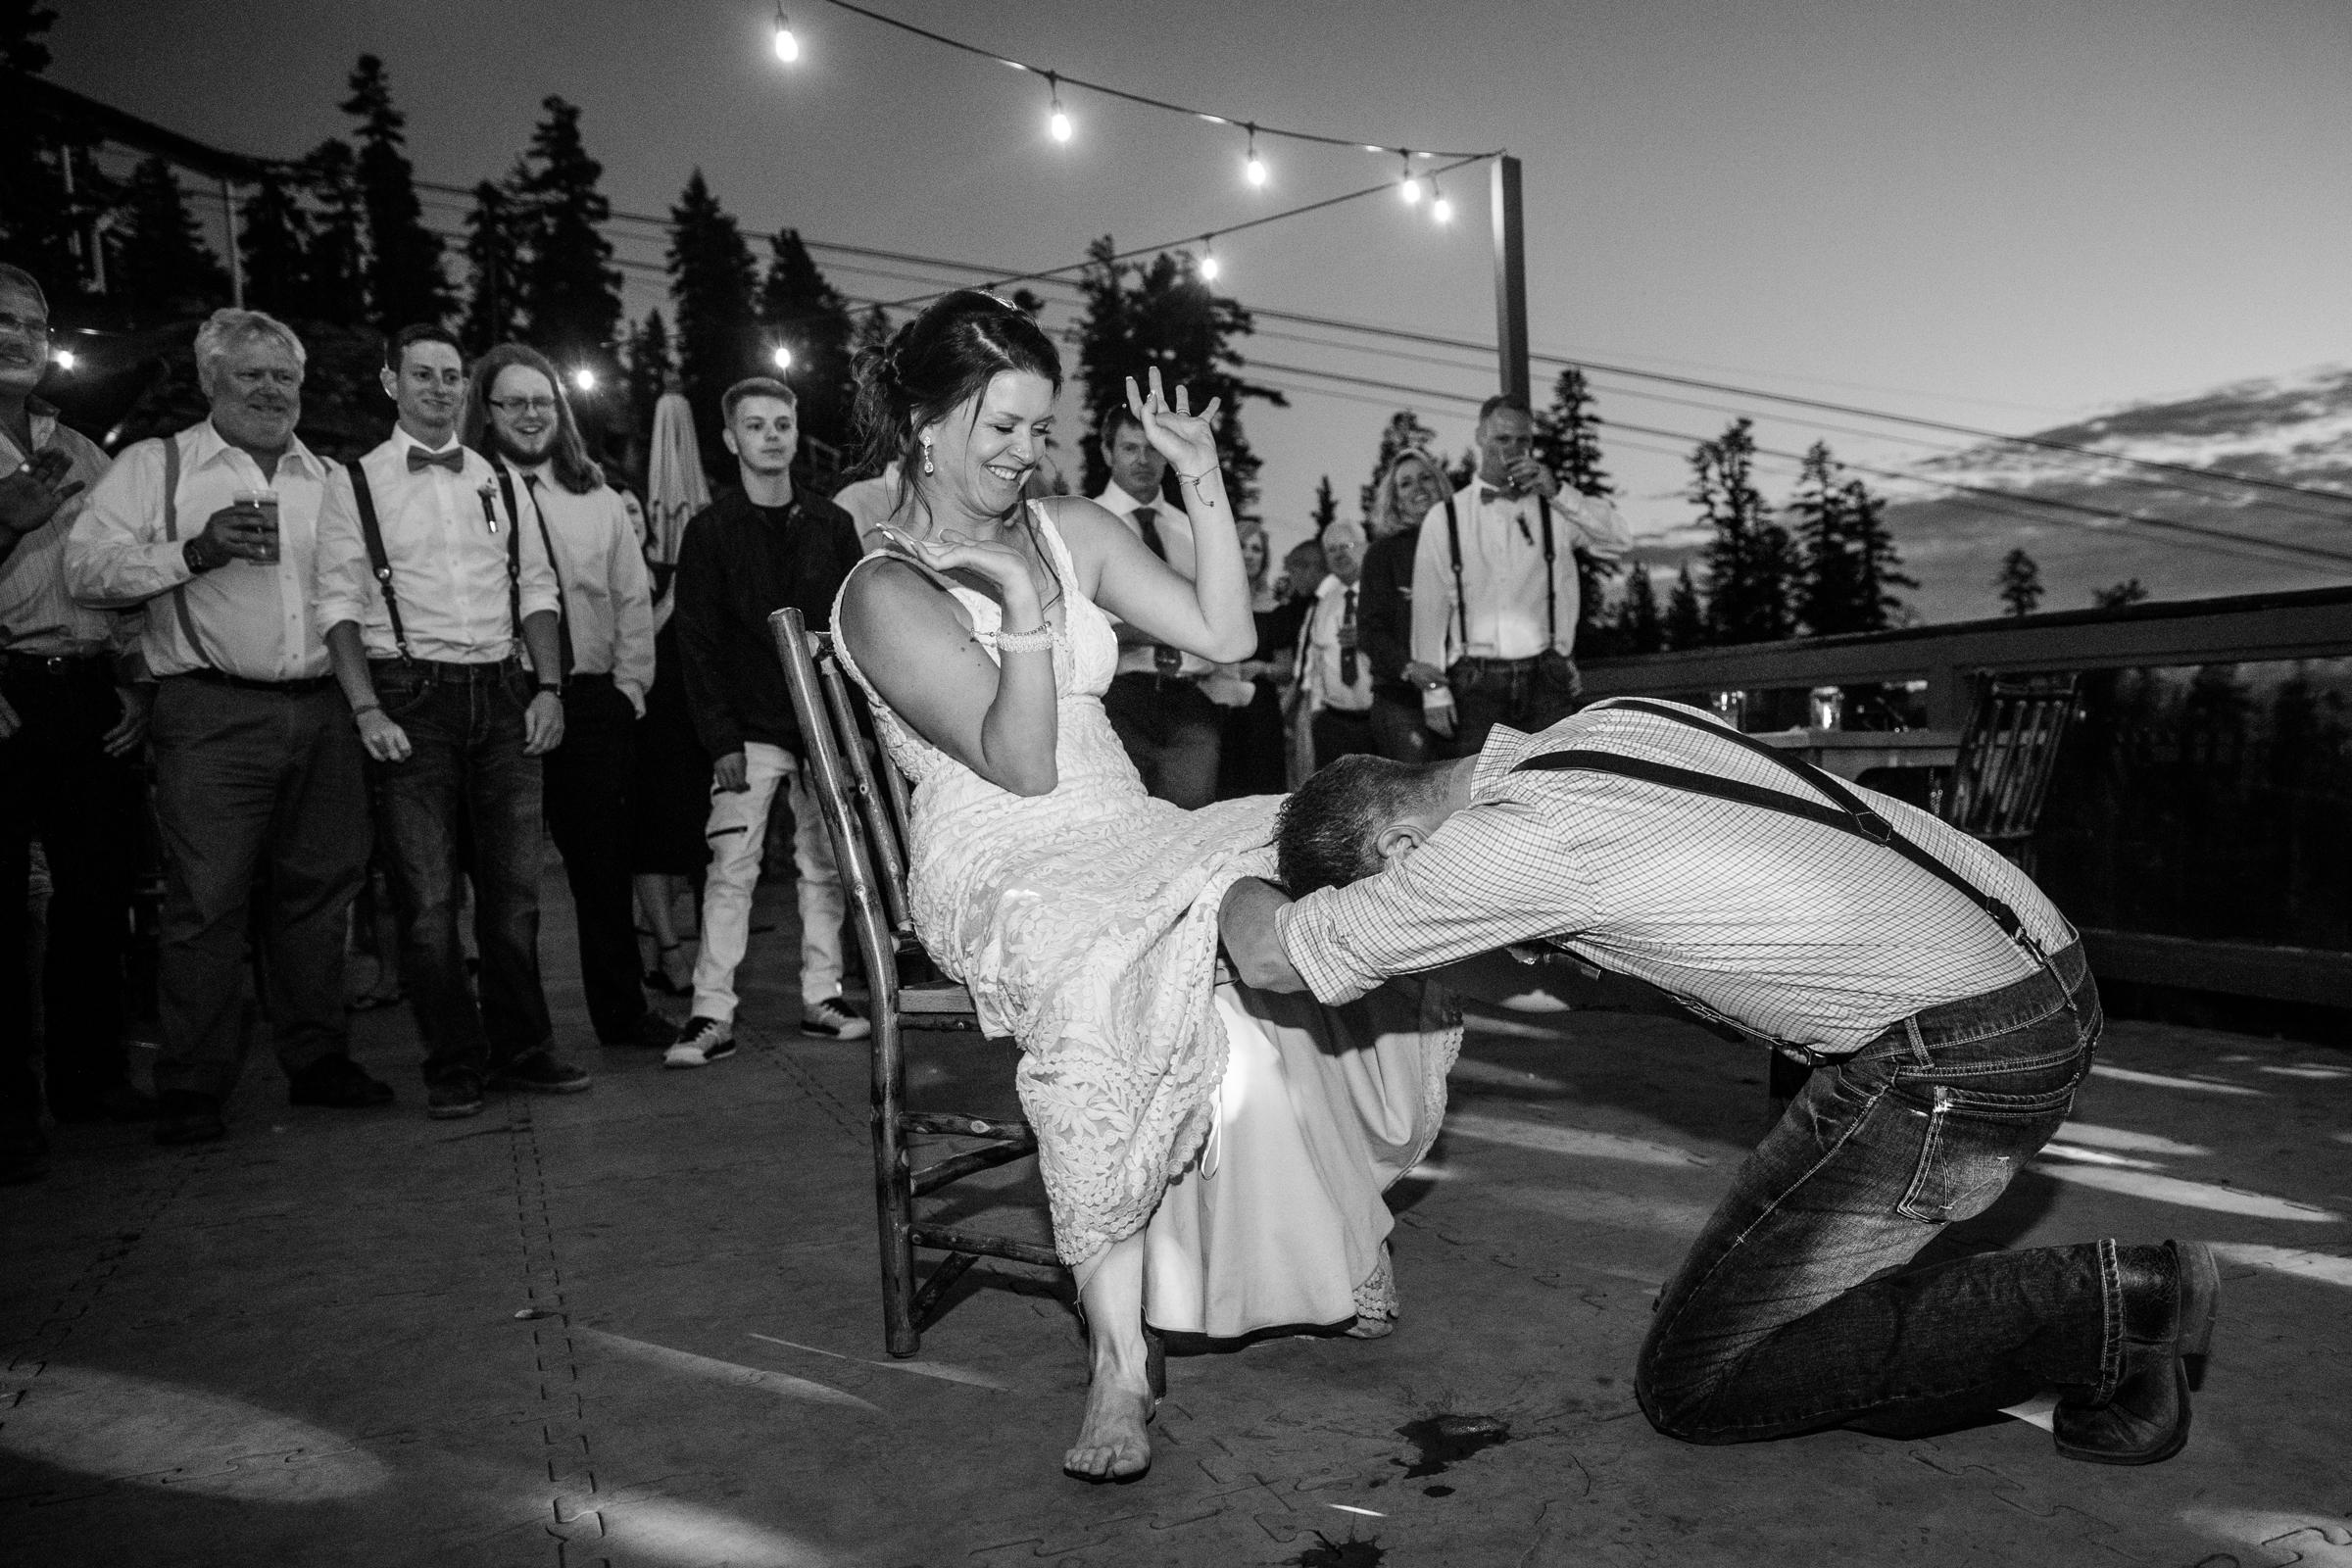 lake-tahoe-wedding-photographer-photography-heavenly-lake-view-lodge-south-lake-tahoe-top-best